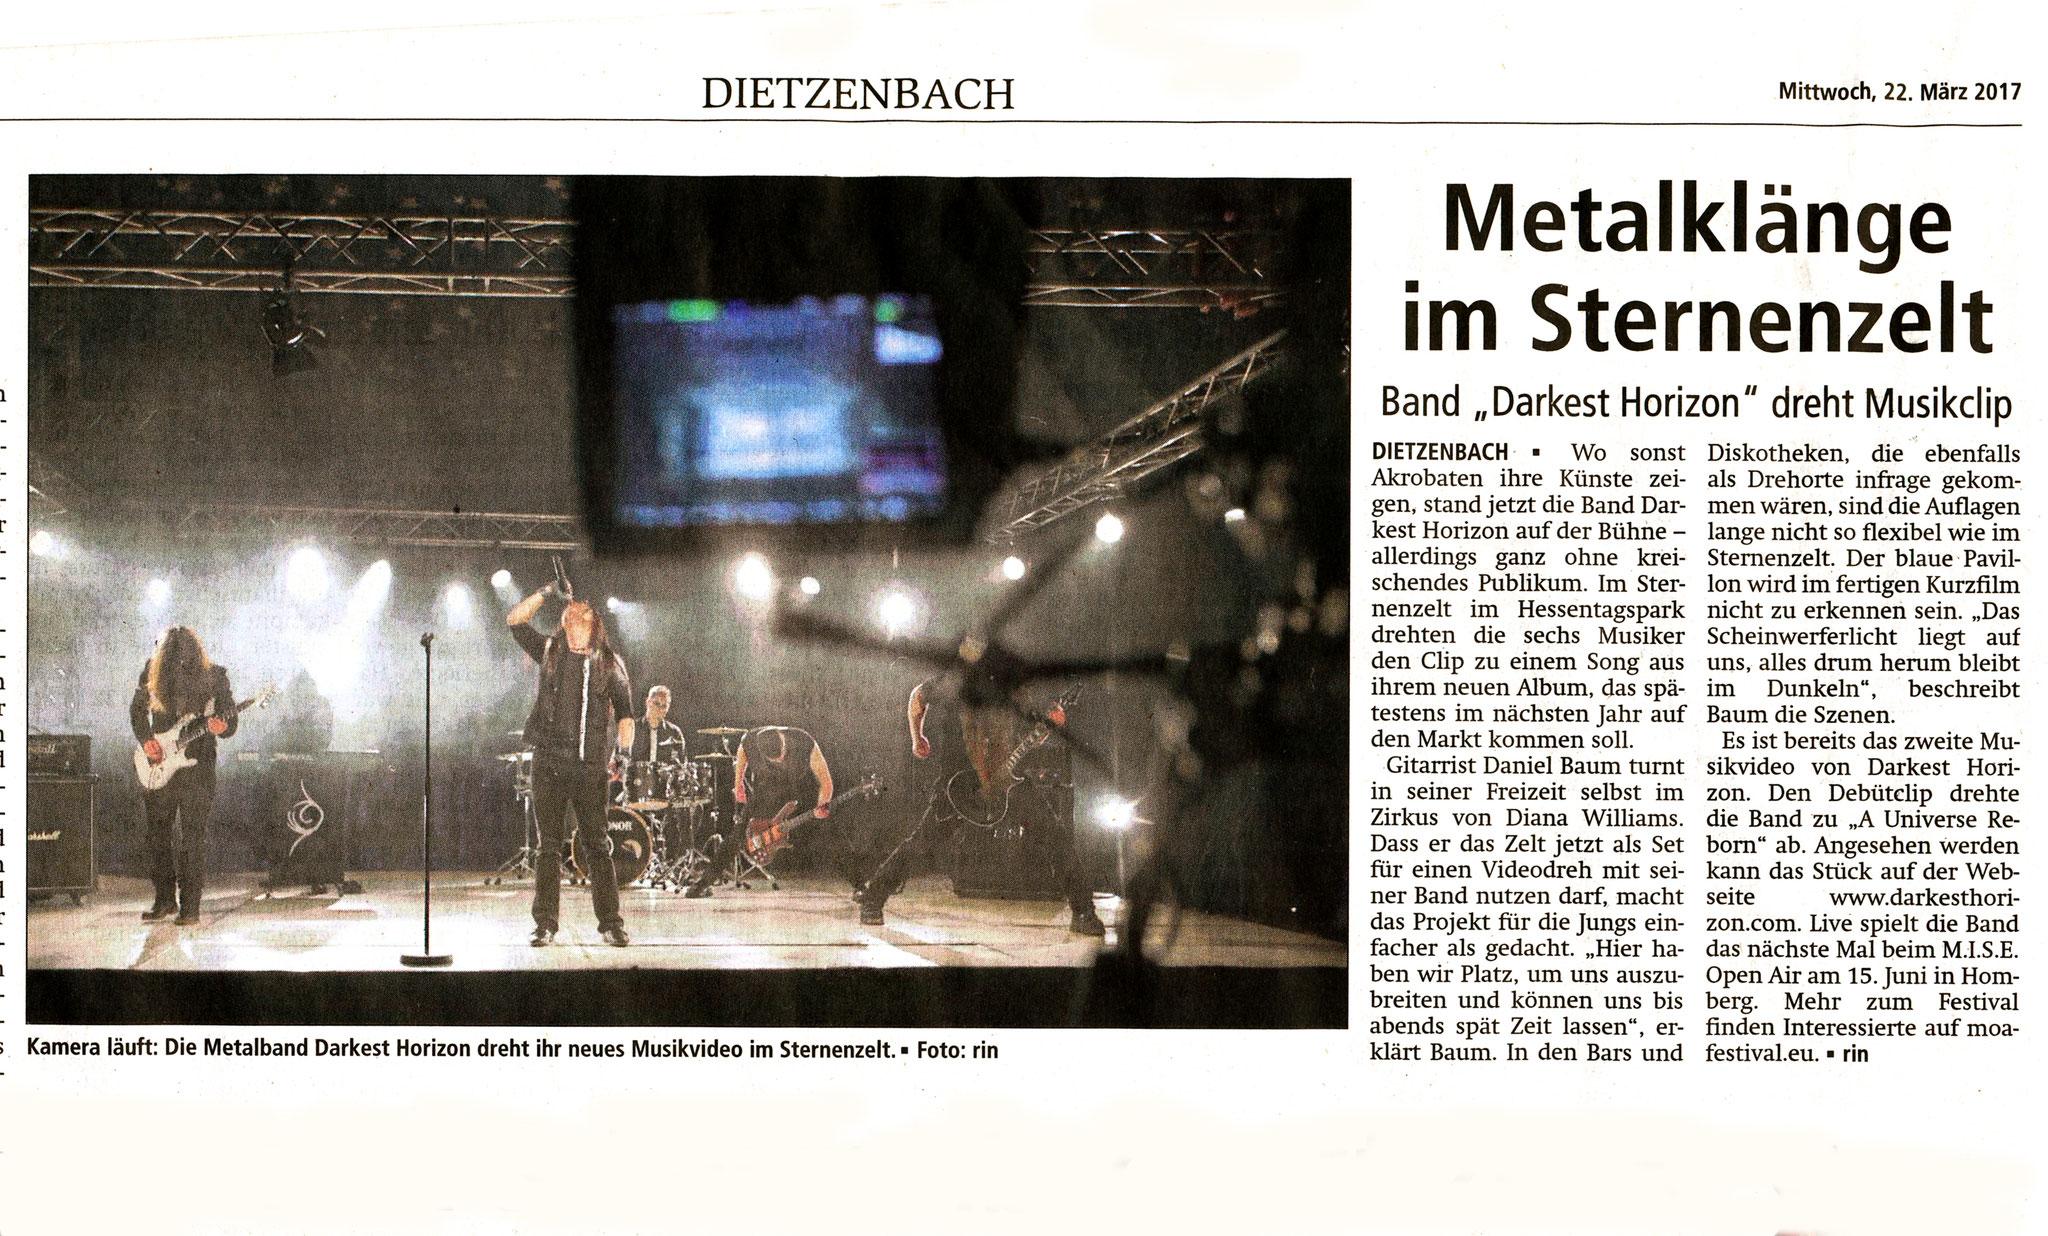 Offenbach Post, 22. März 2017